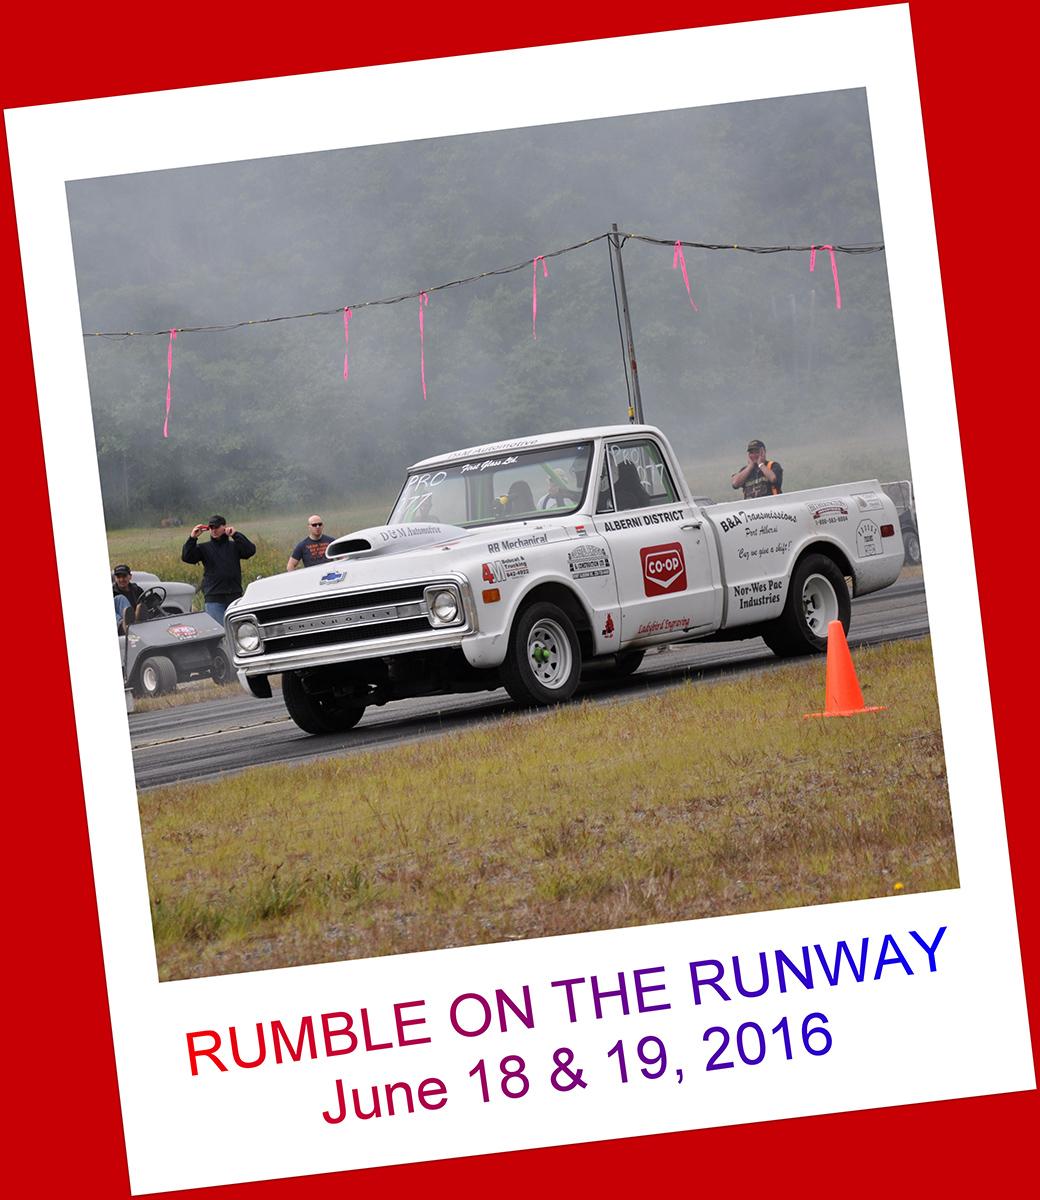 Rumble on the Runway June 18 & 19, 2016 1126